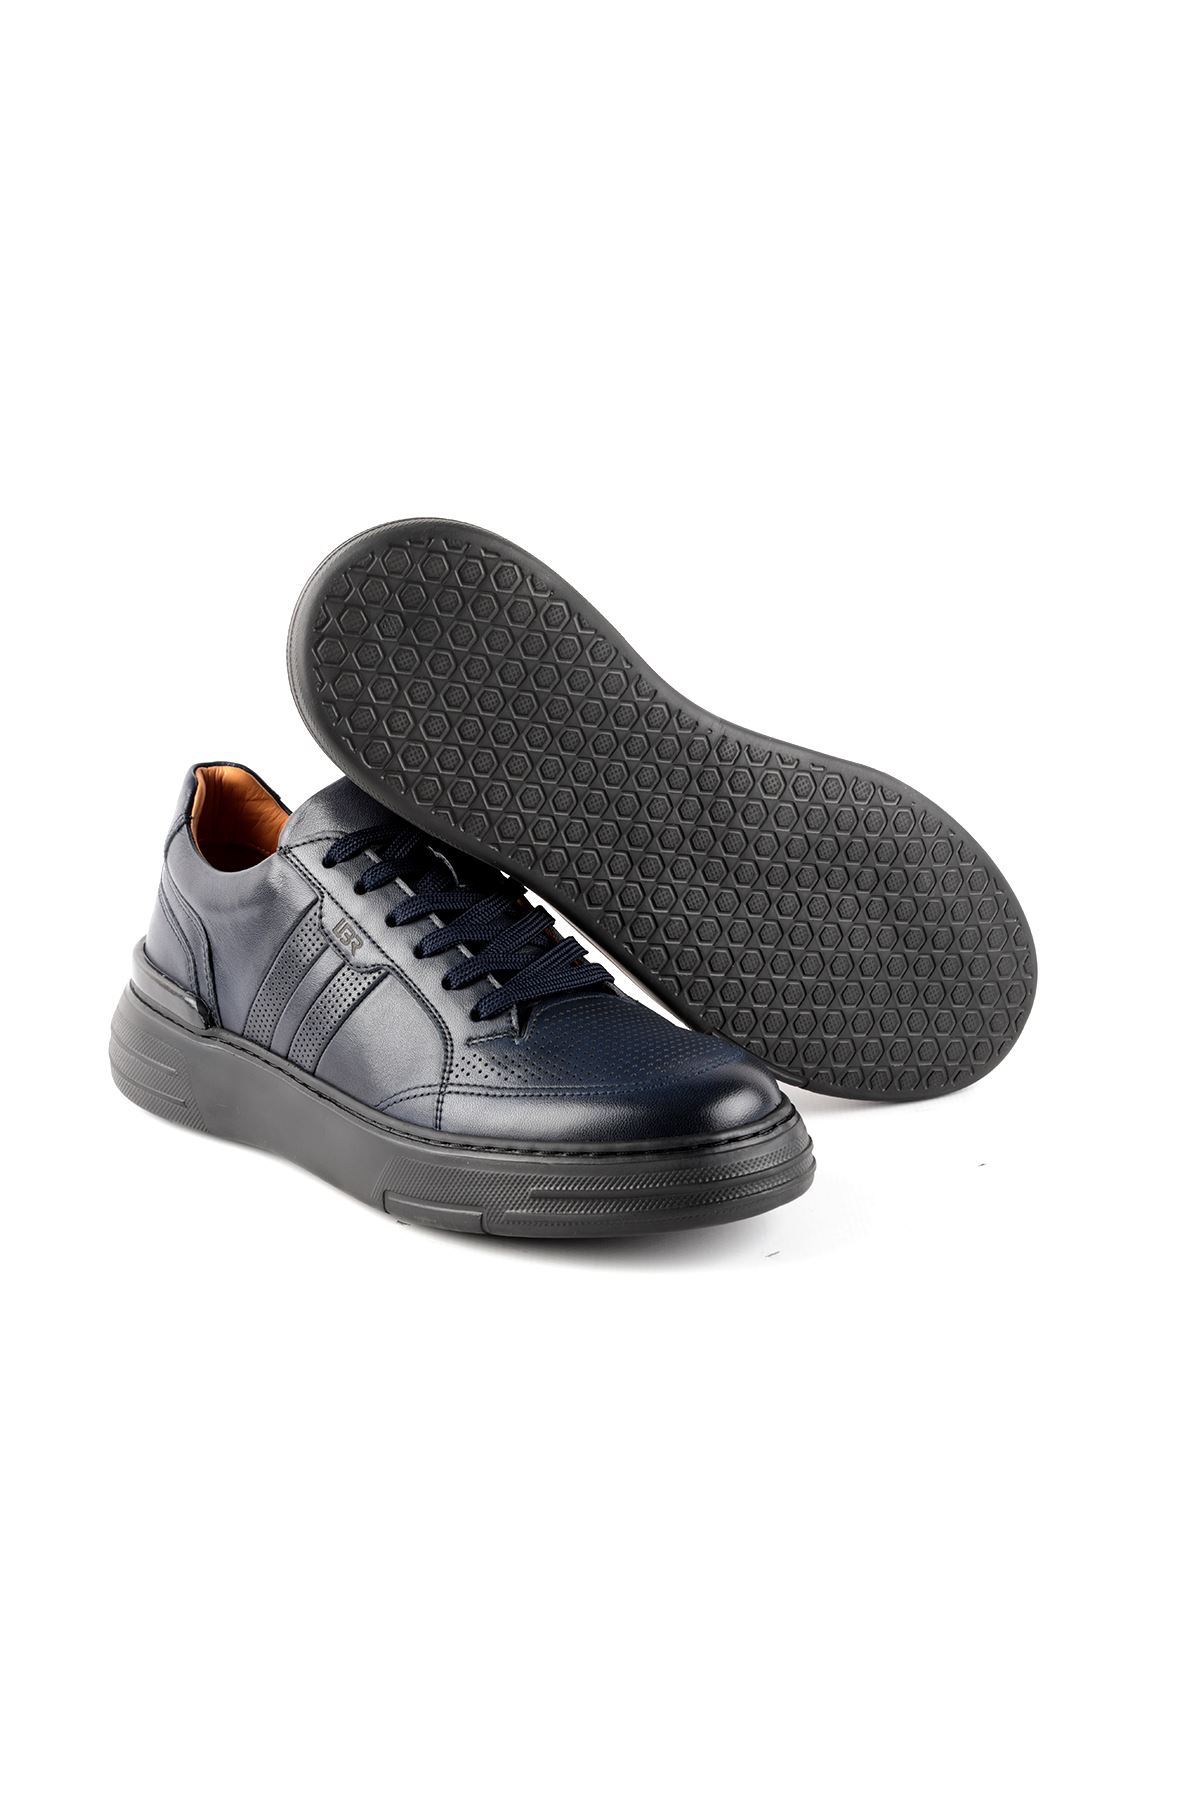 Libero L3796 Lacivert Spor Ayakkabı